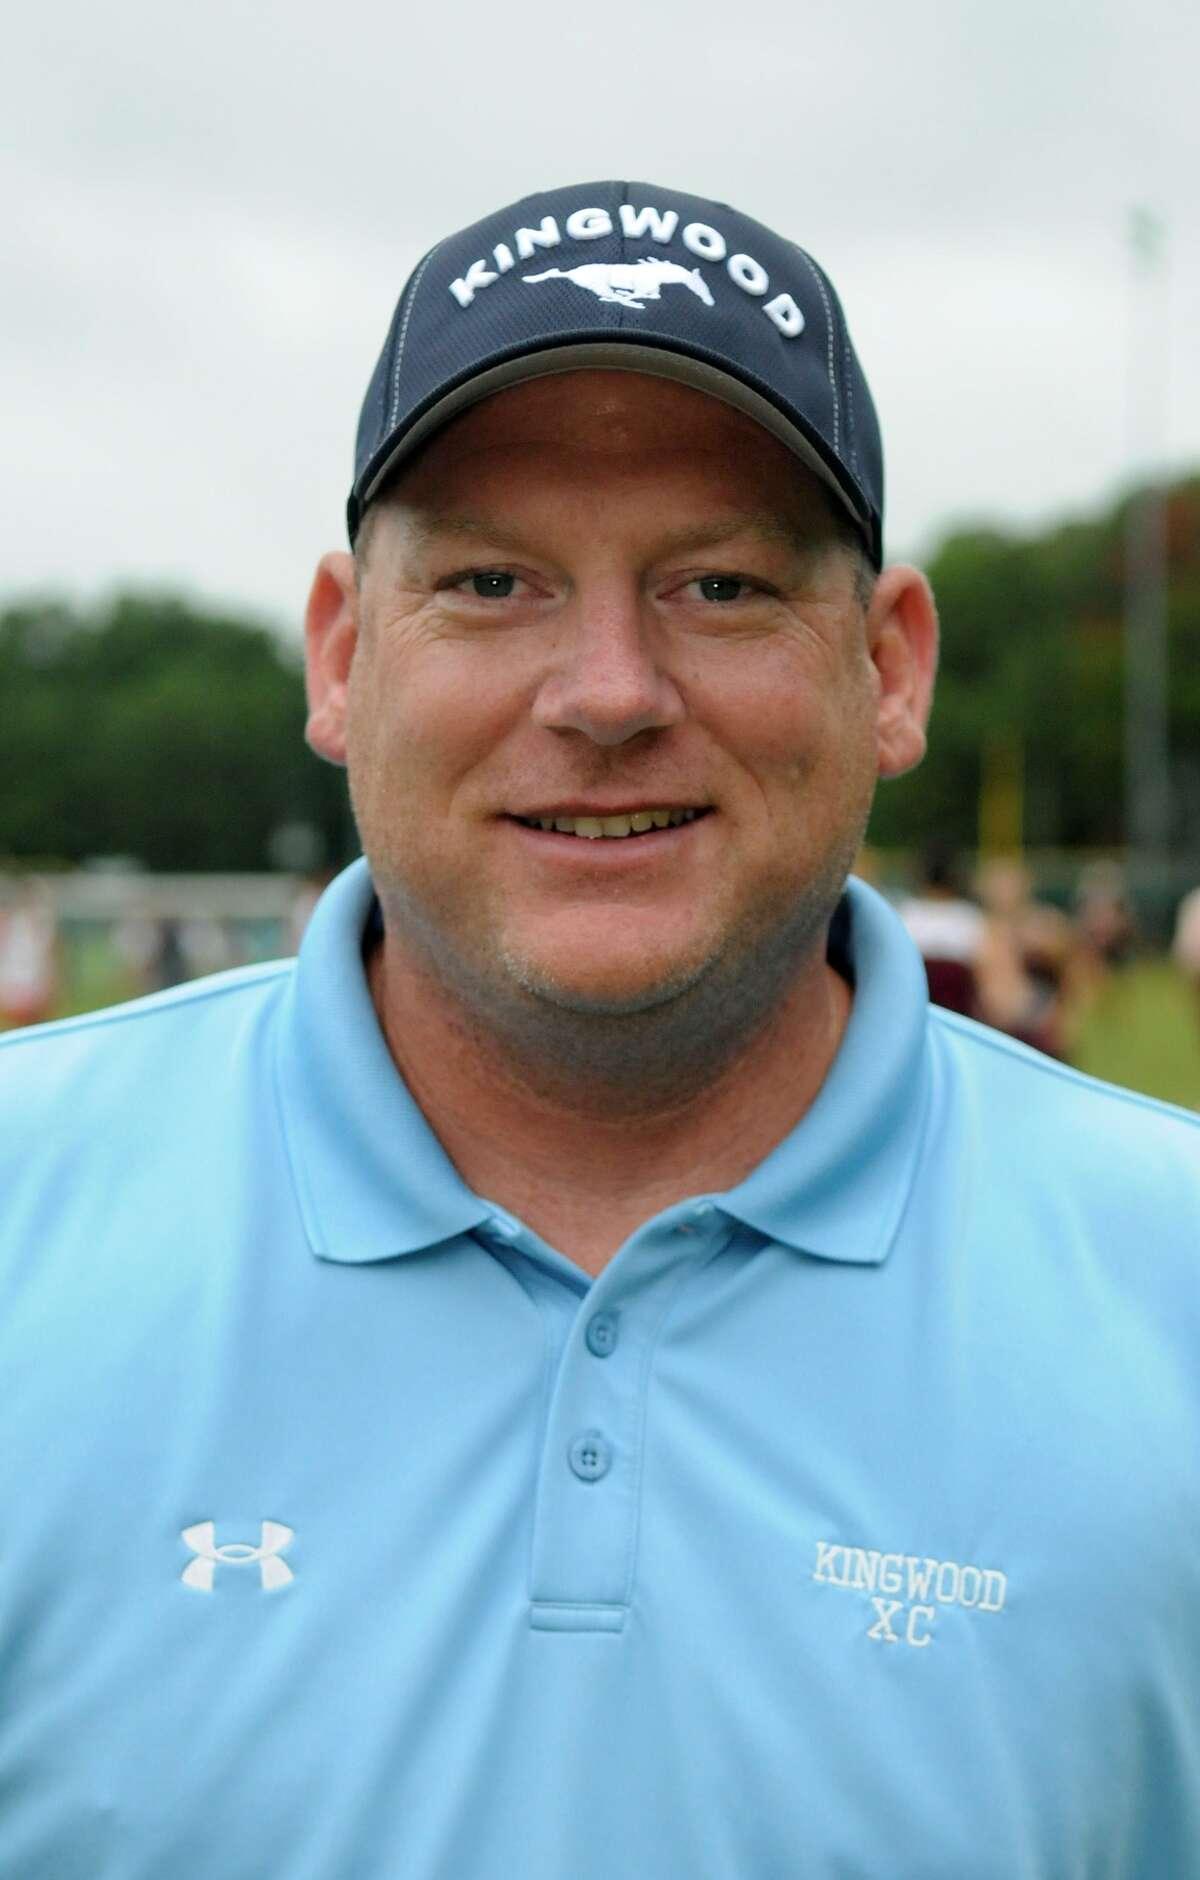 Kingwood Boys Cross Country Coach Tate Symons